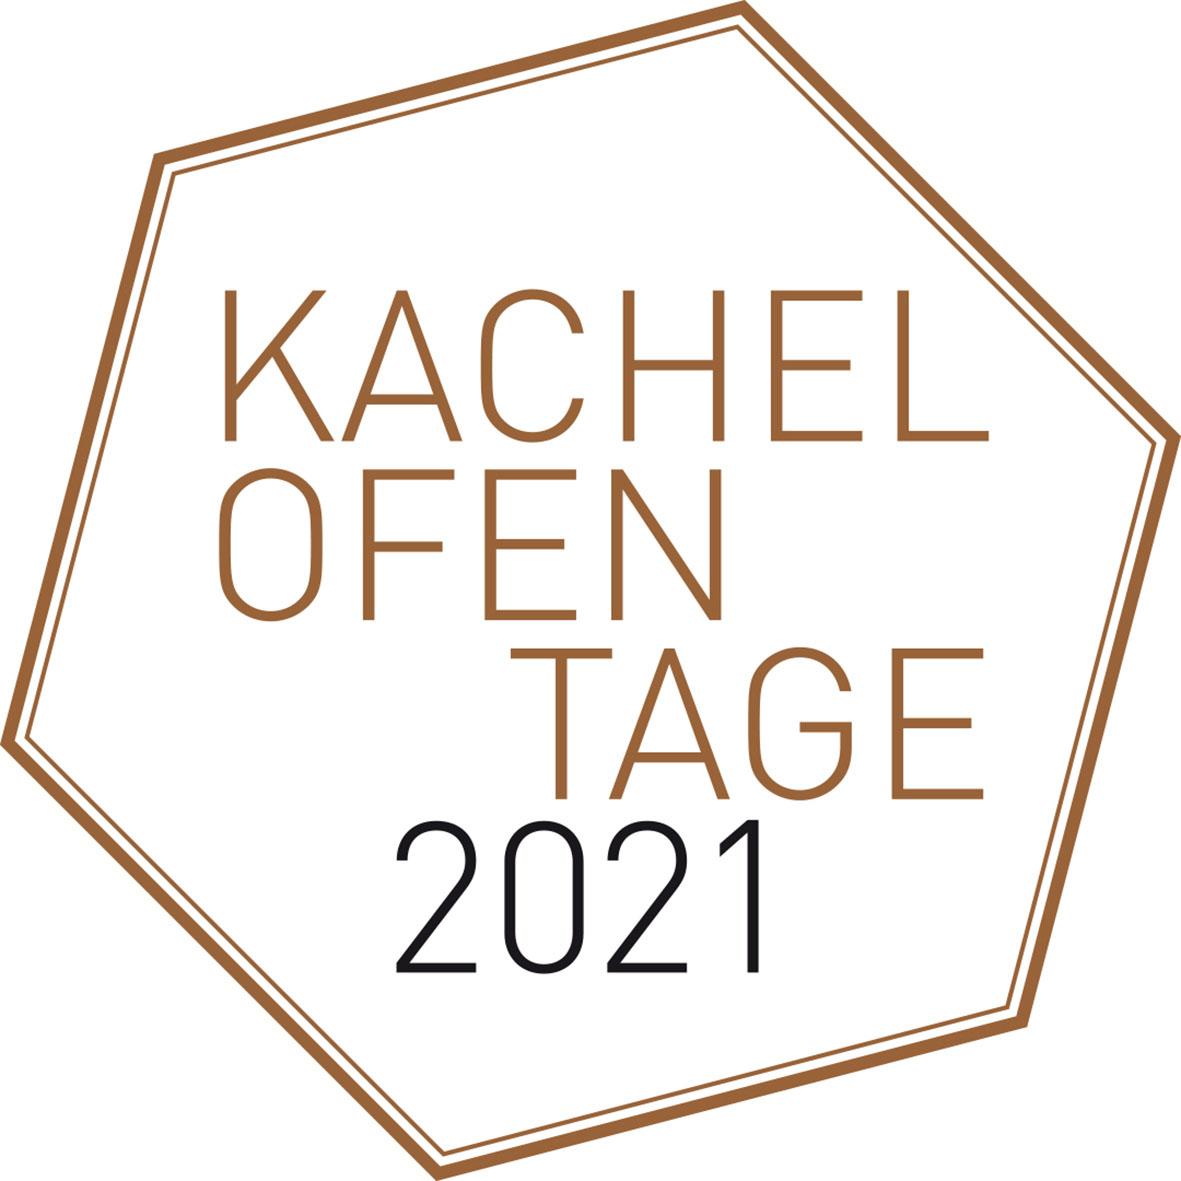 Kachelofentage 2021